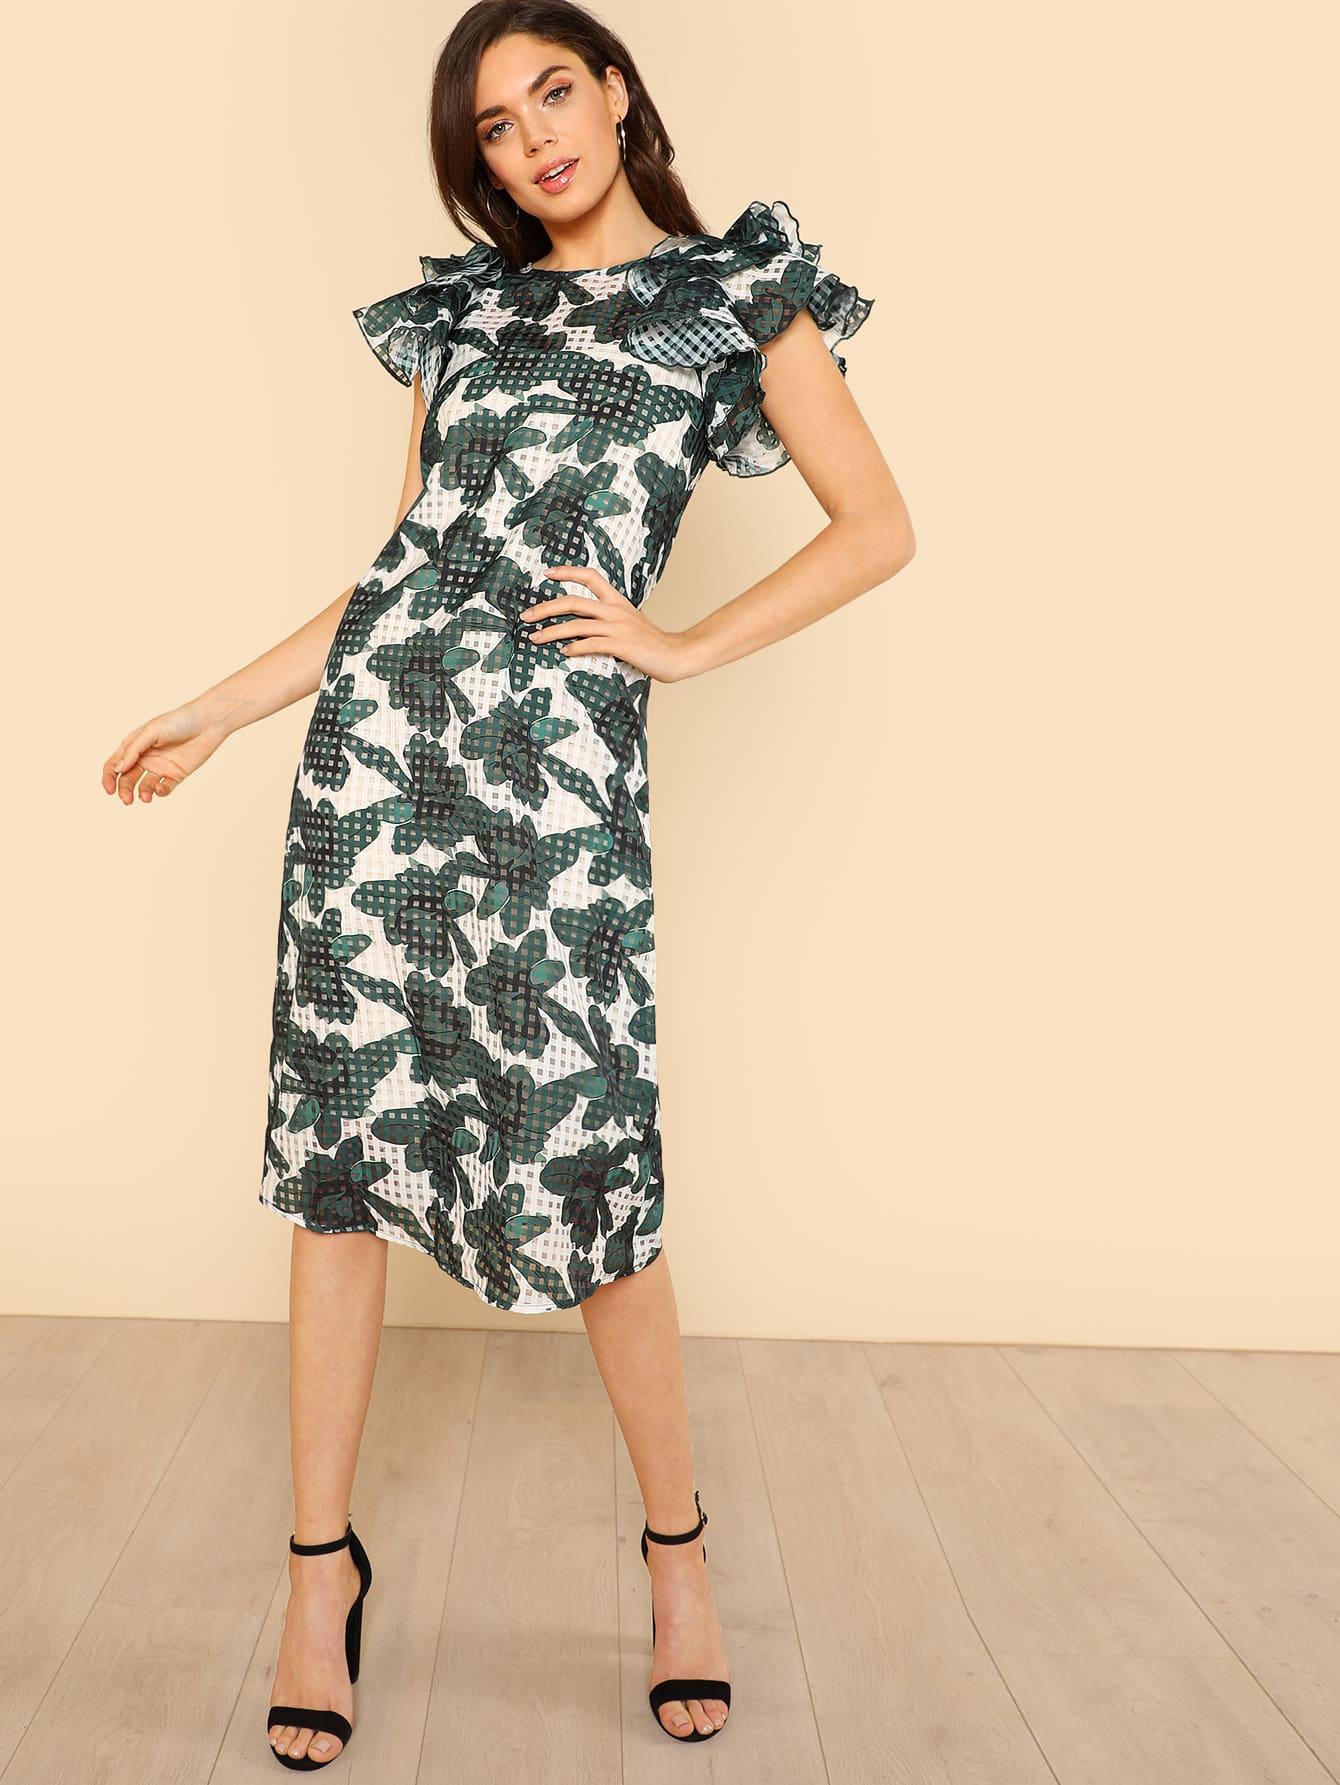 Layered Ruffle Trim Floral Dress layered ruffle trim satin wrap dress